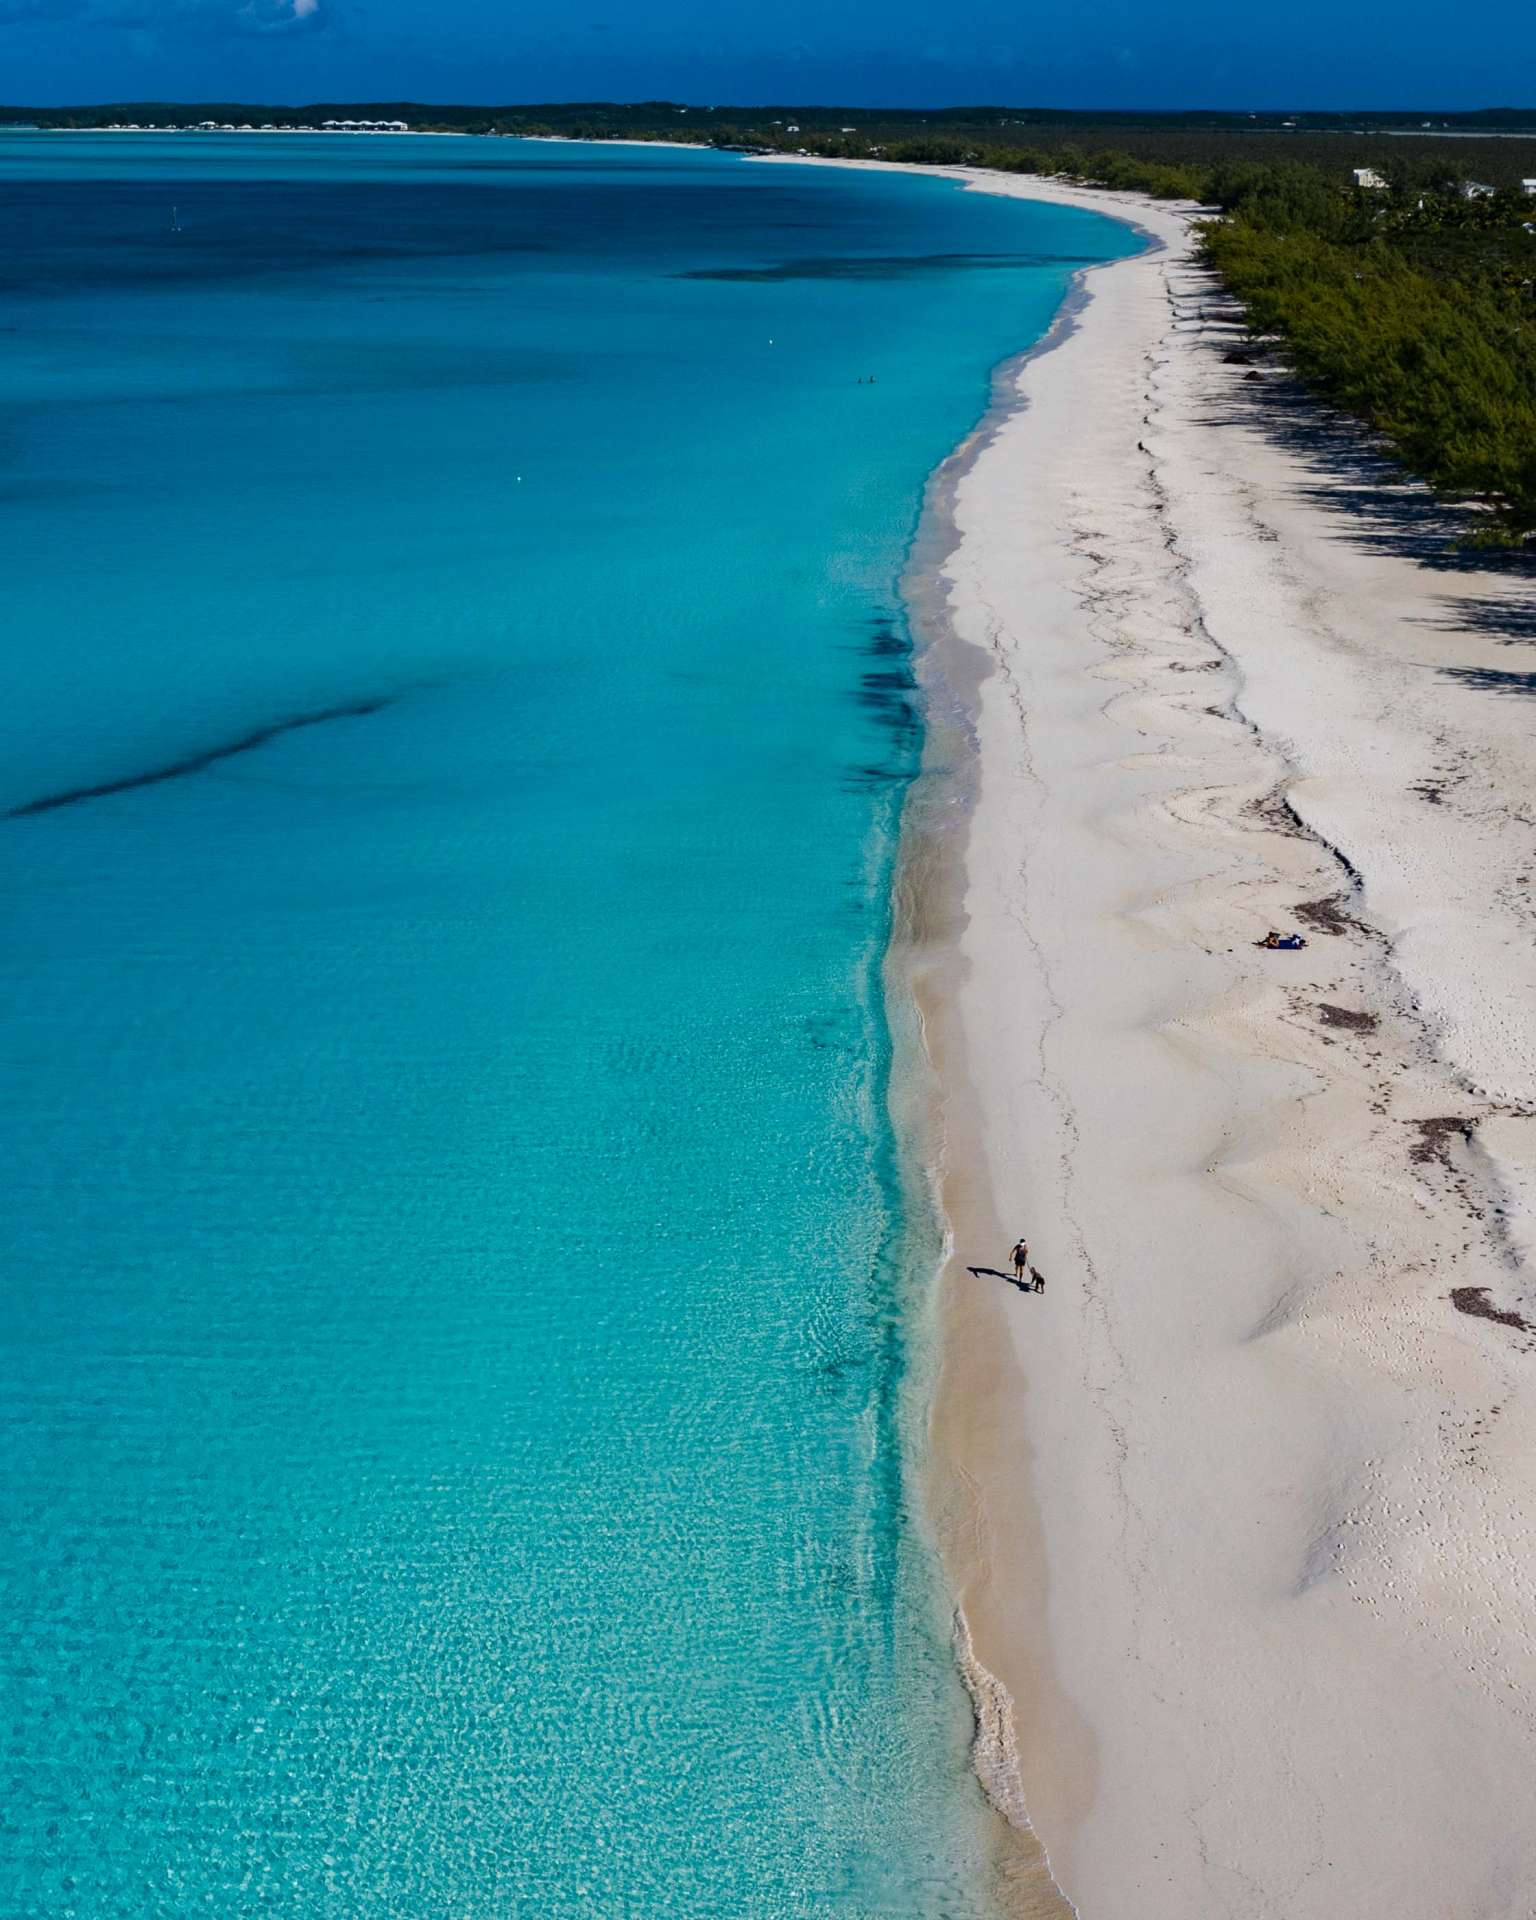 Bahamas Long Island Cape Santa Maria Beach by drone 2